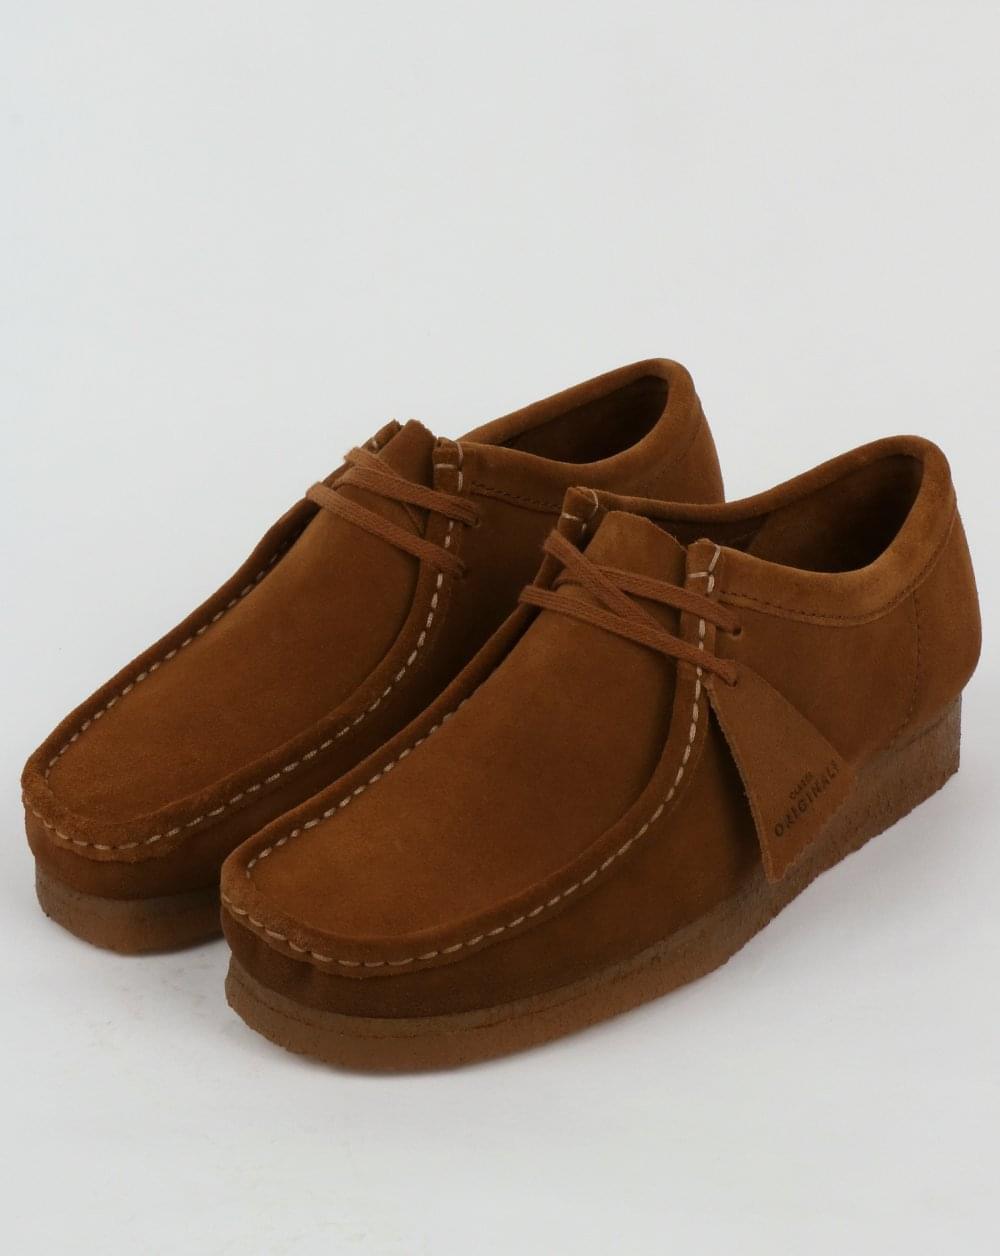 Clarks Originals Wallabee Shoes in Cola Suede - rich brown crepe sole moccasin